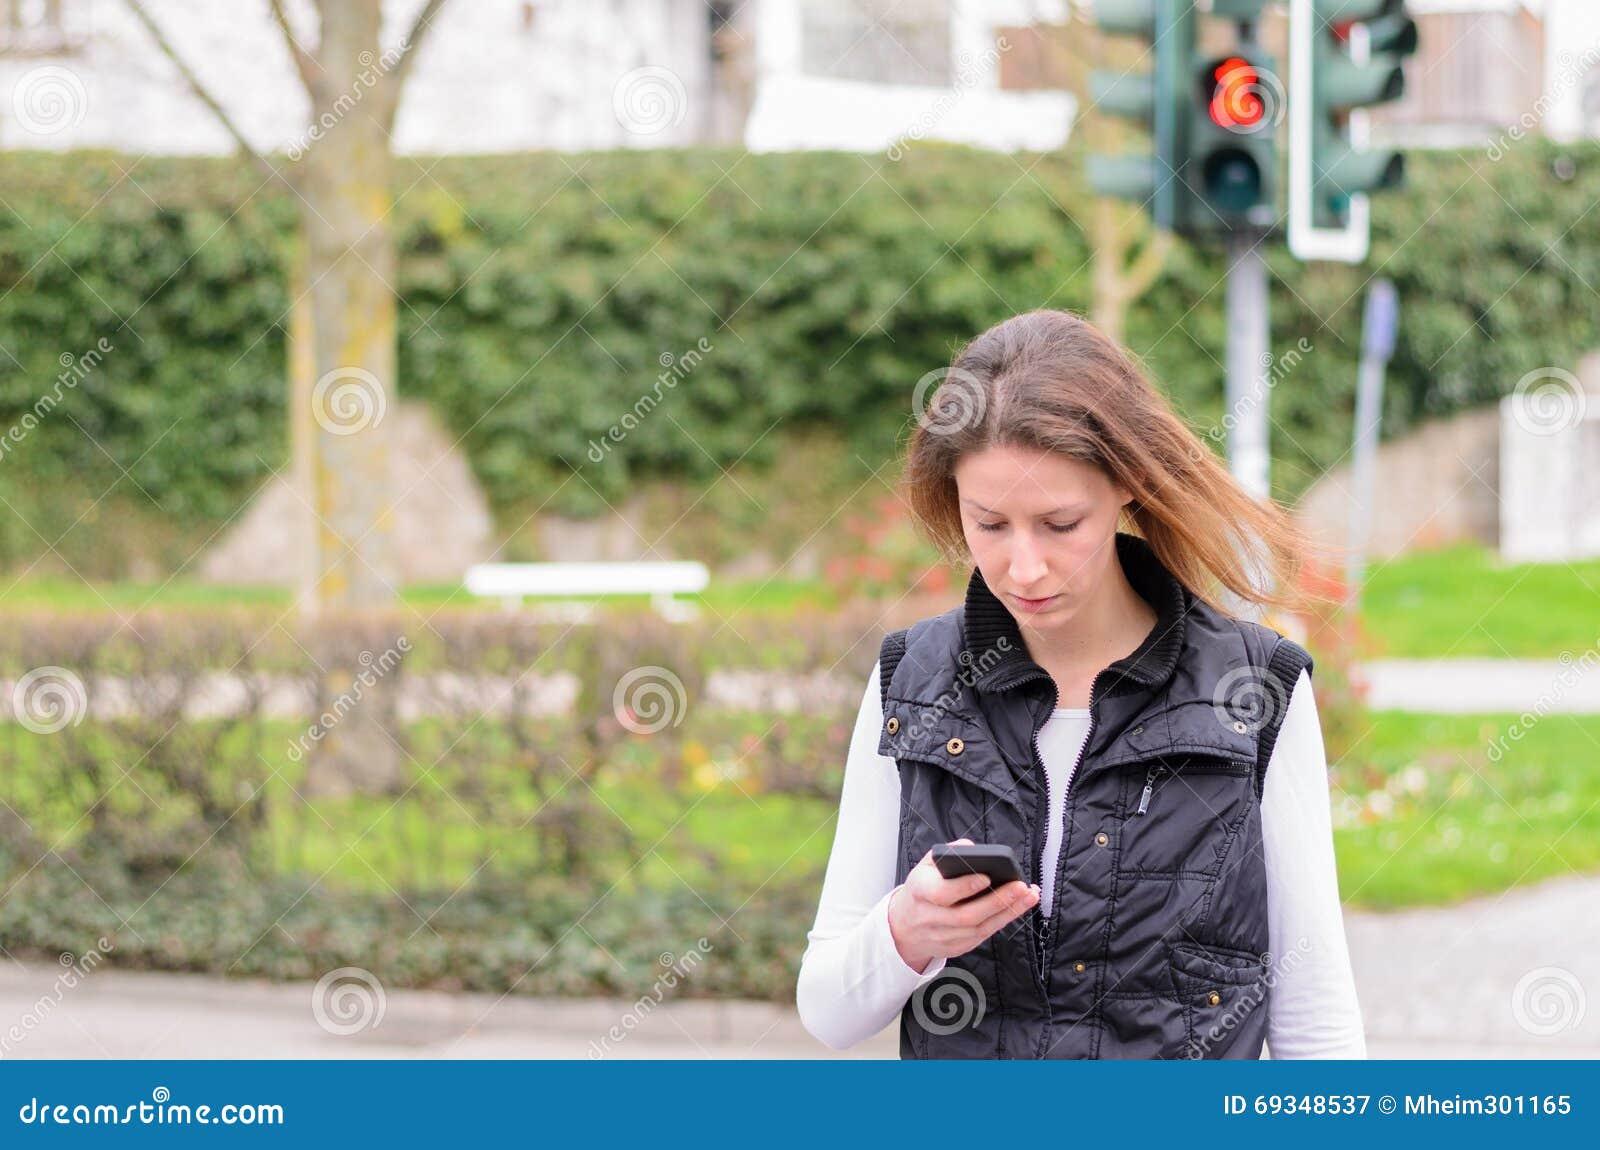 single women phone number